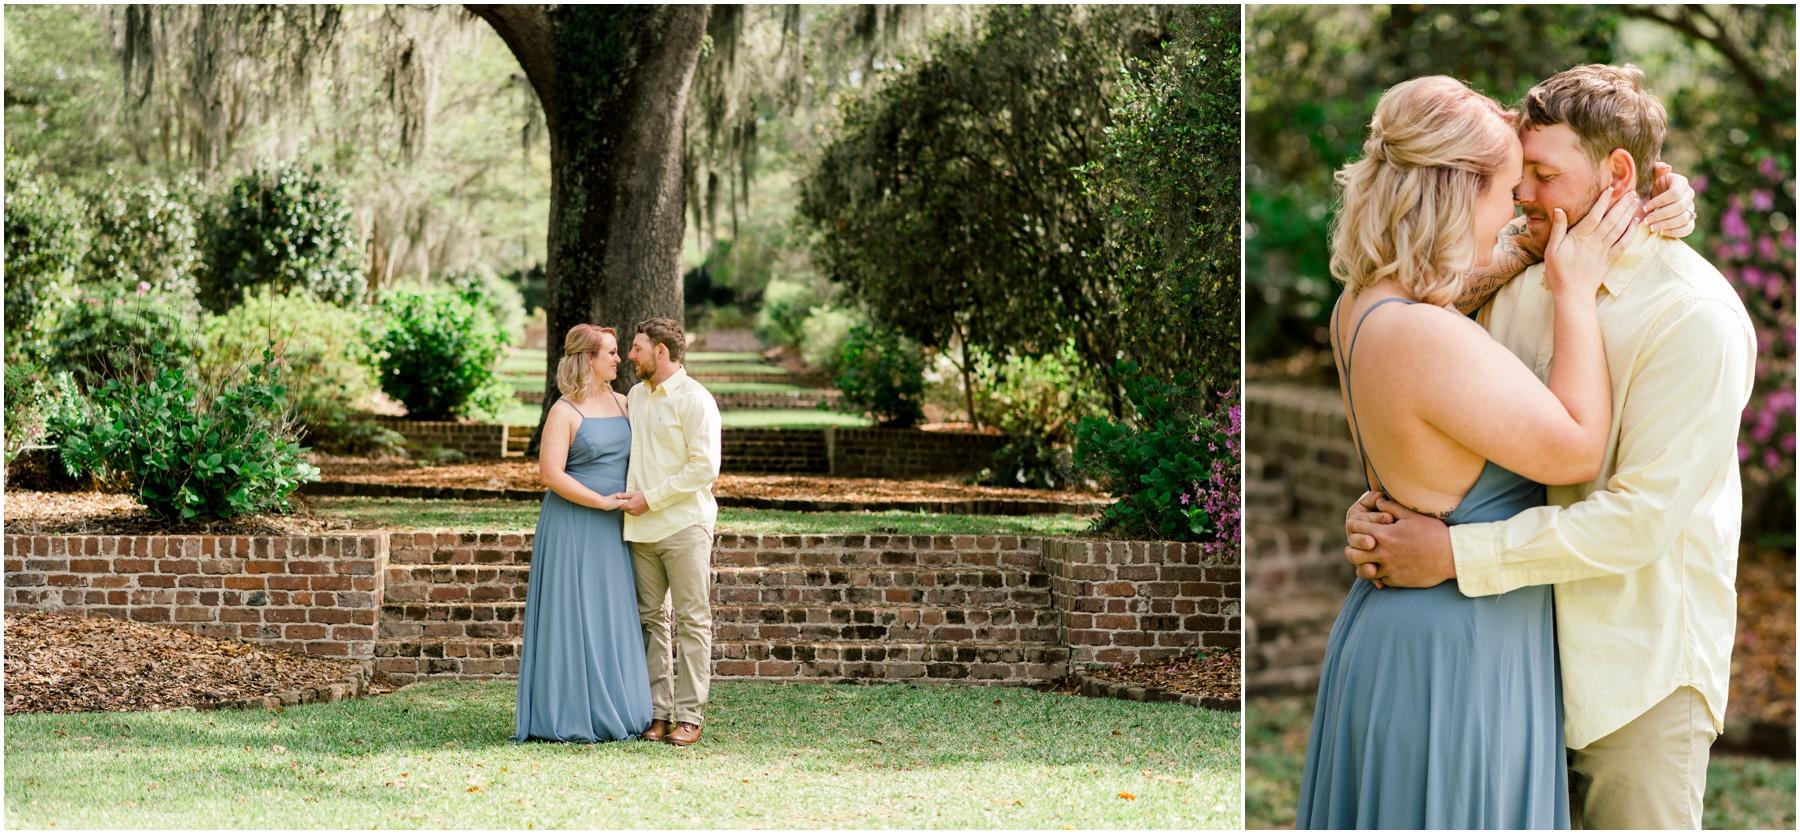 Mepkin-Abbey-Moncks-Corner-South-Carolina-Engagement-Session-Photos_0002.jpg